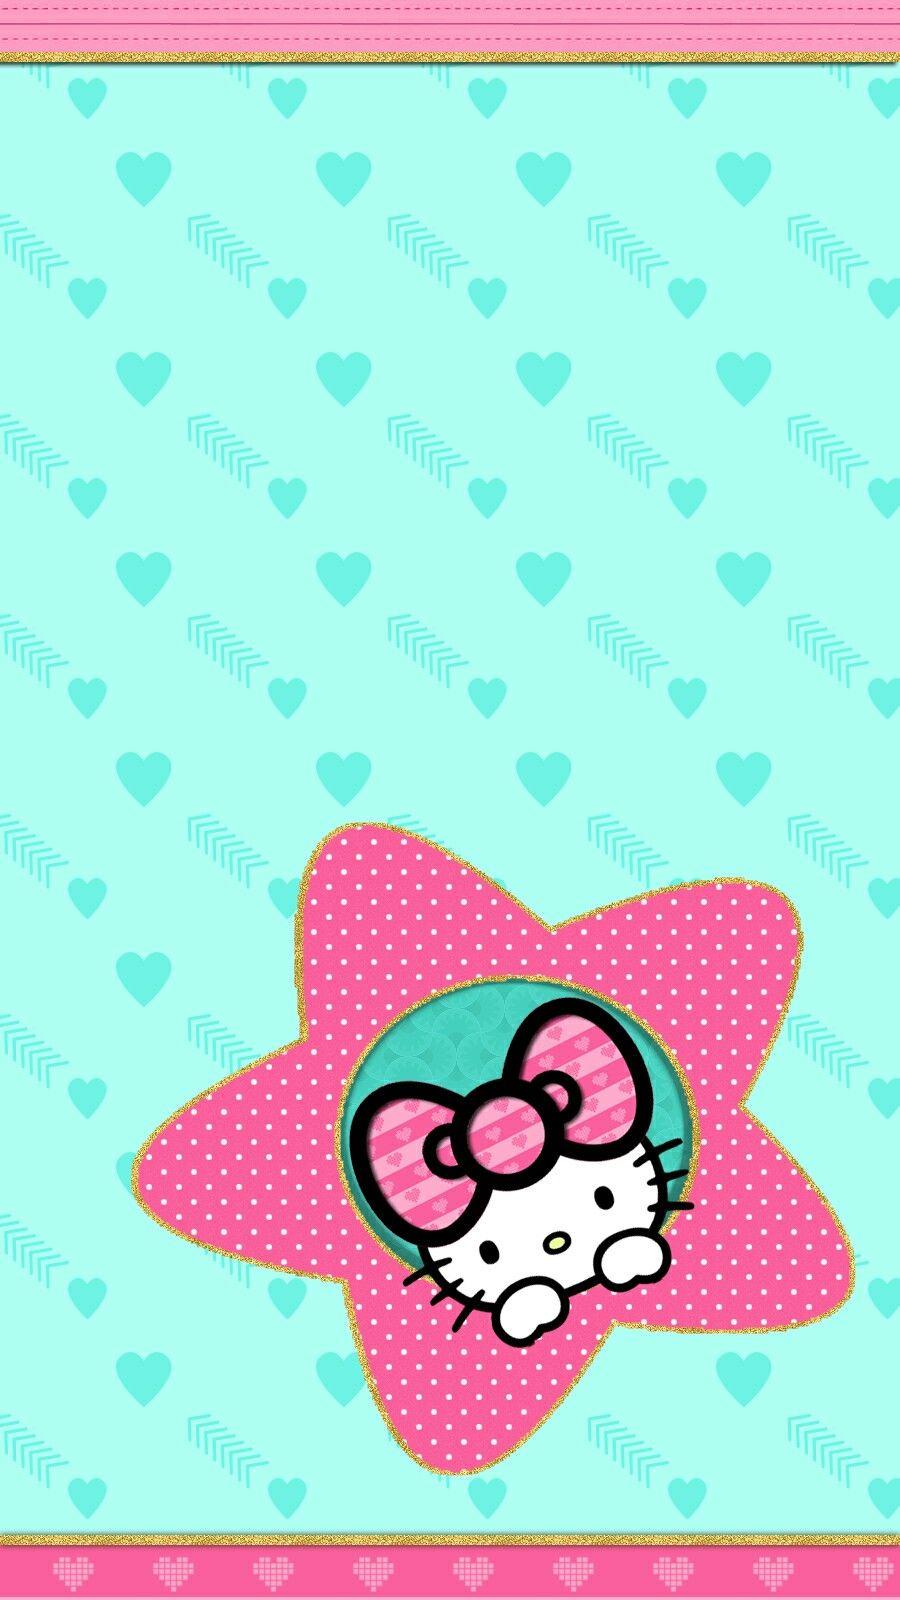 Cool Wallpaper Hello Kitty Design - f9b6ab3490e6865f1b8bd38578cab314  Best Photo Reference_757279.jpg